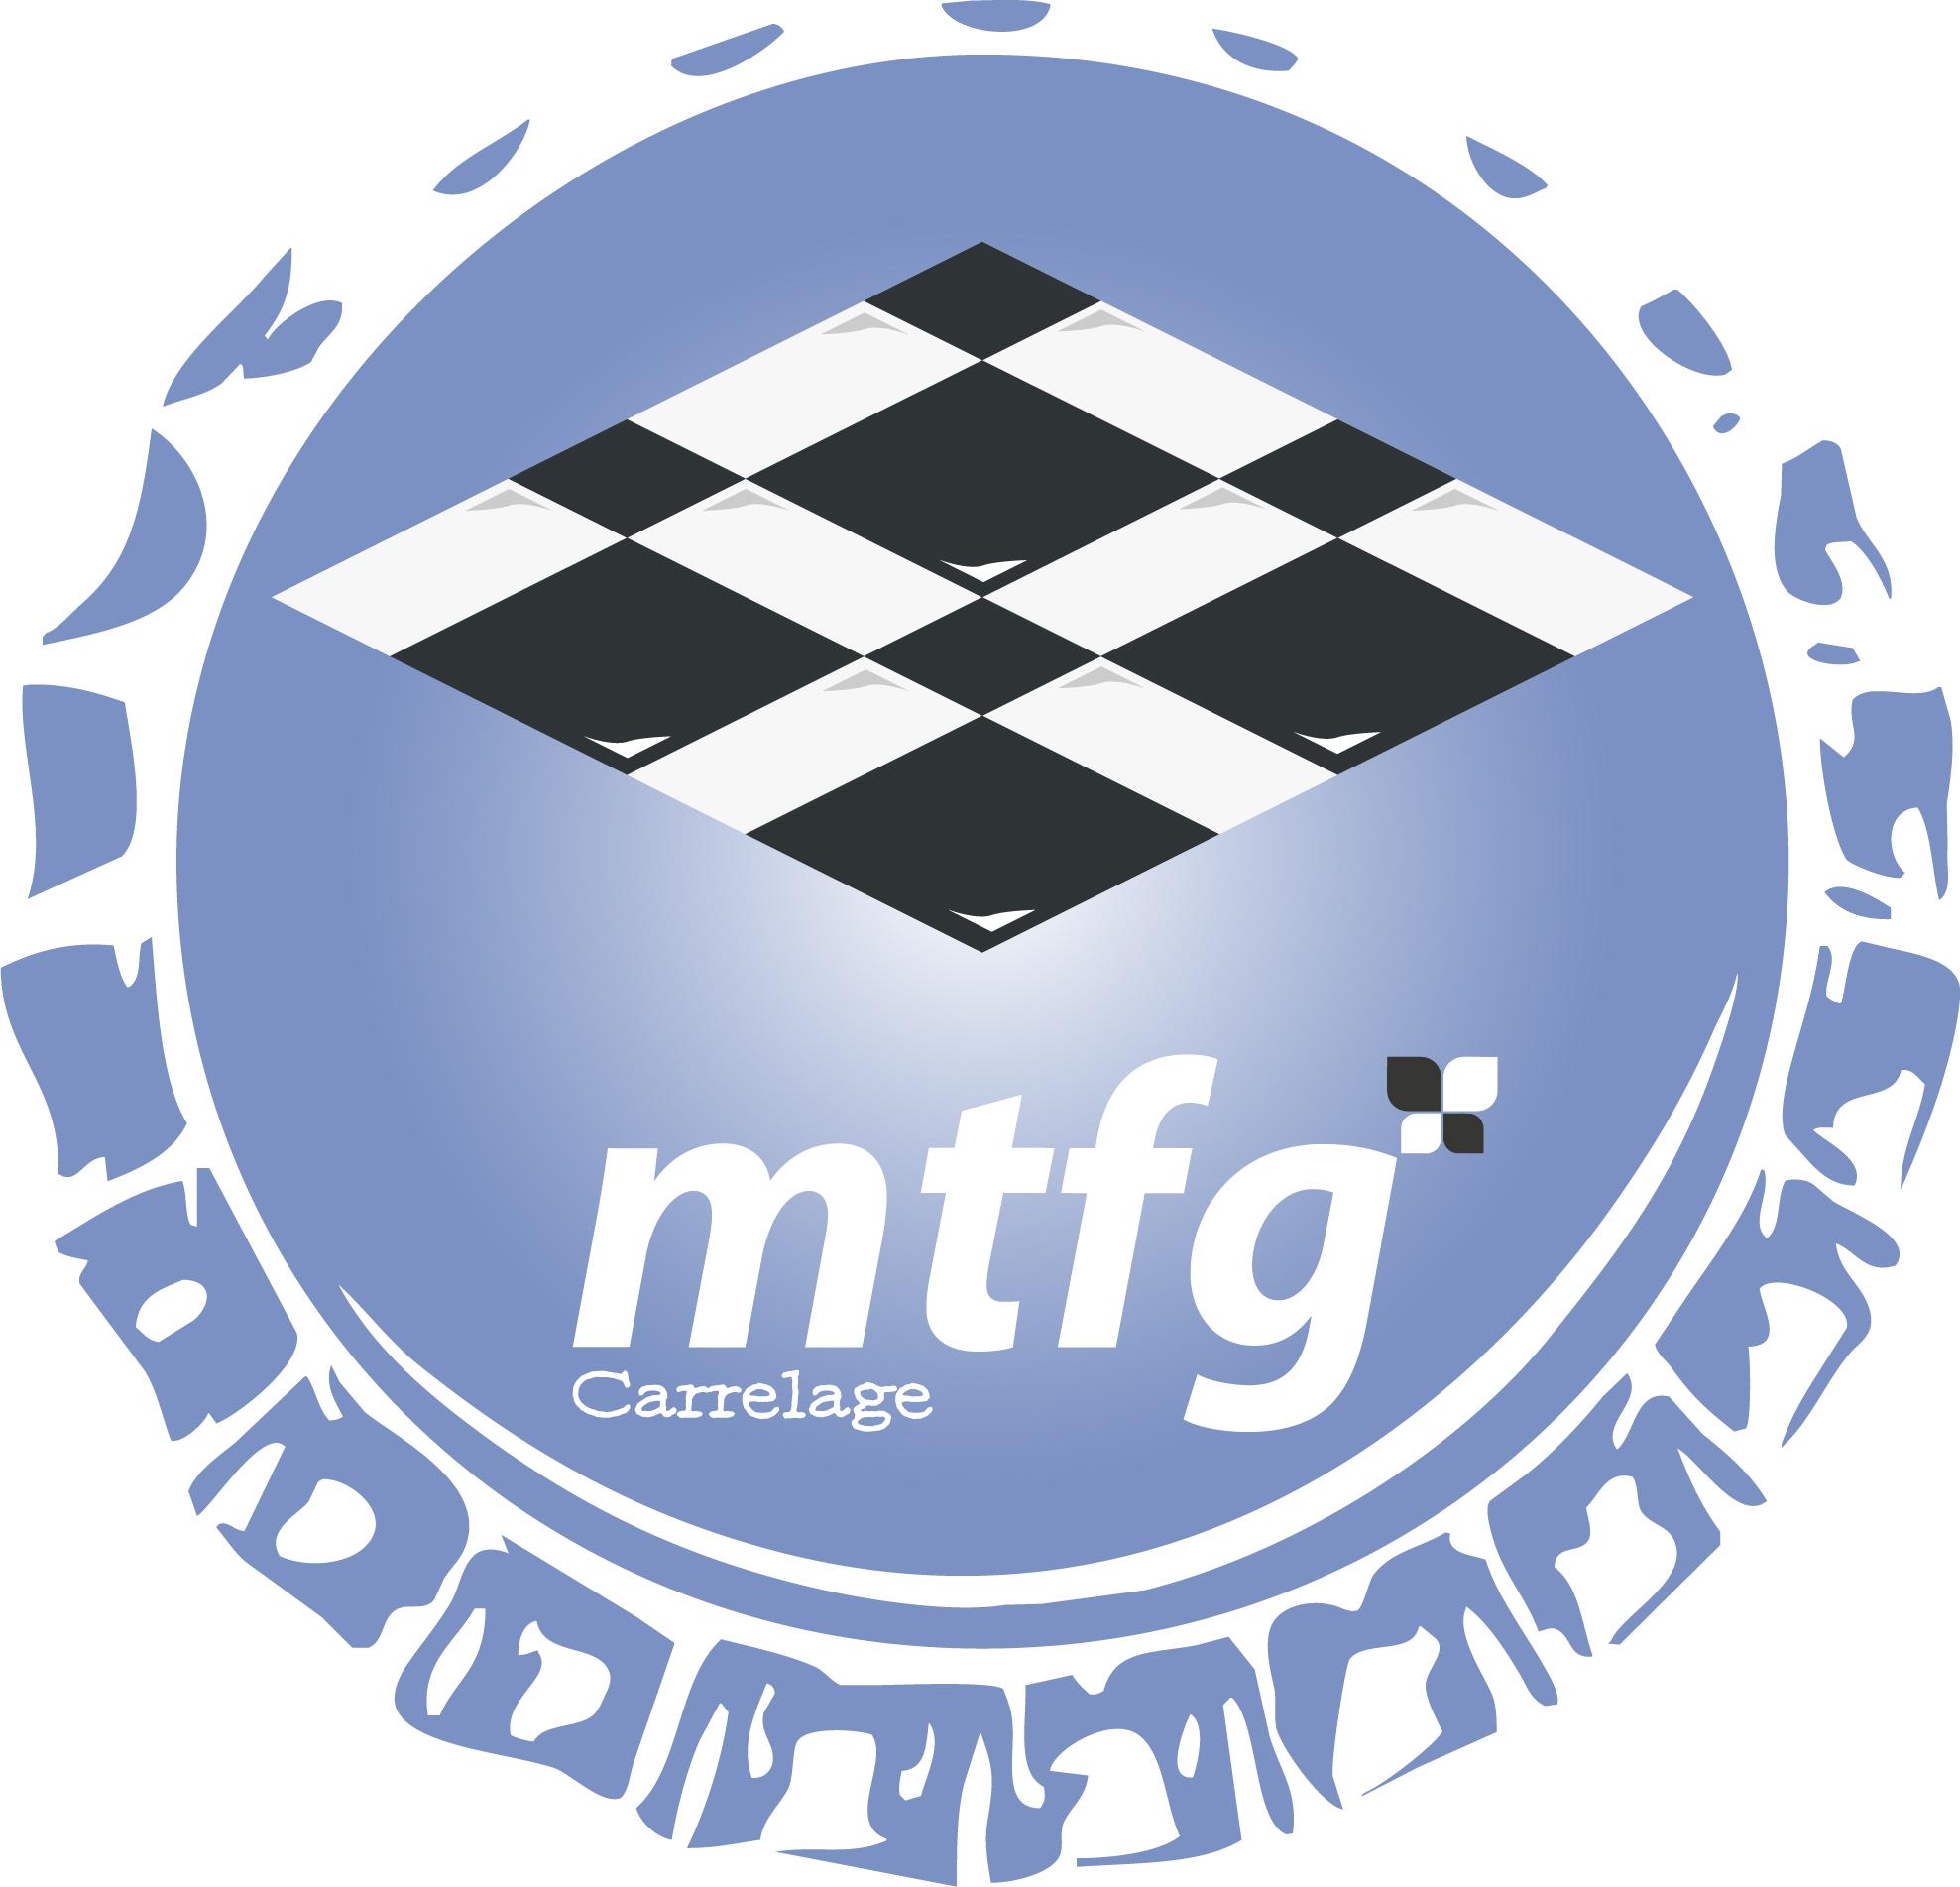 MTFG Carrelage